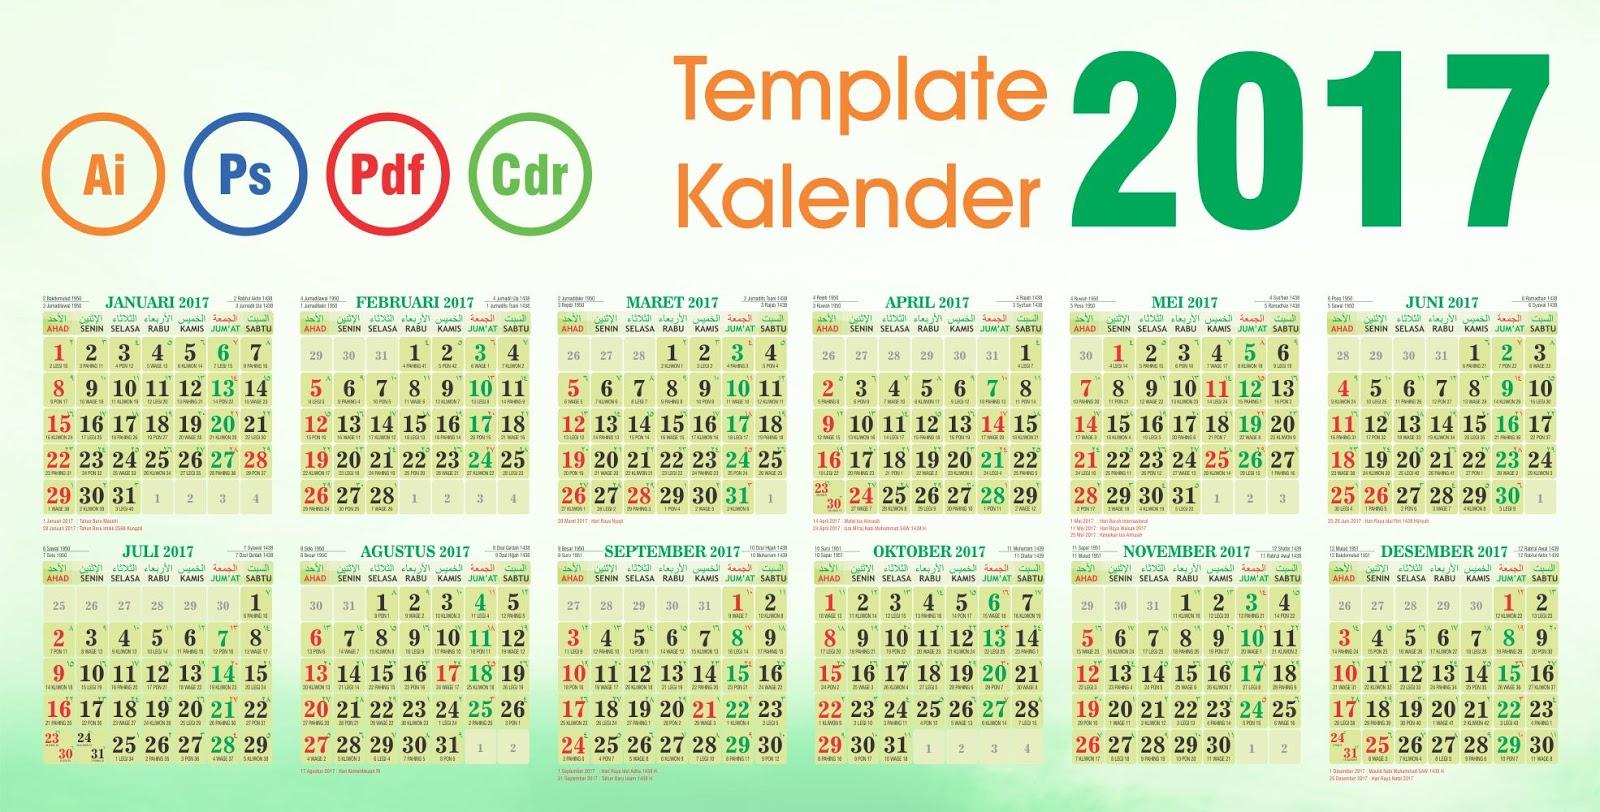 Template kalender 2017 Islami | Fadhil Design